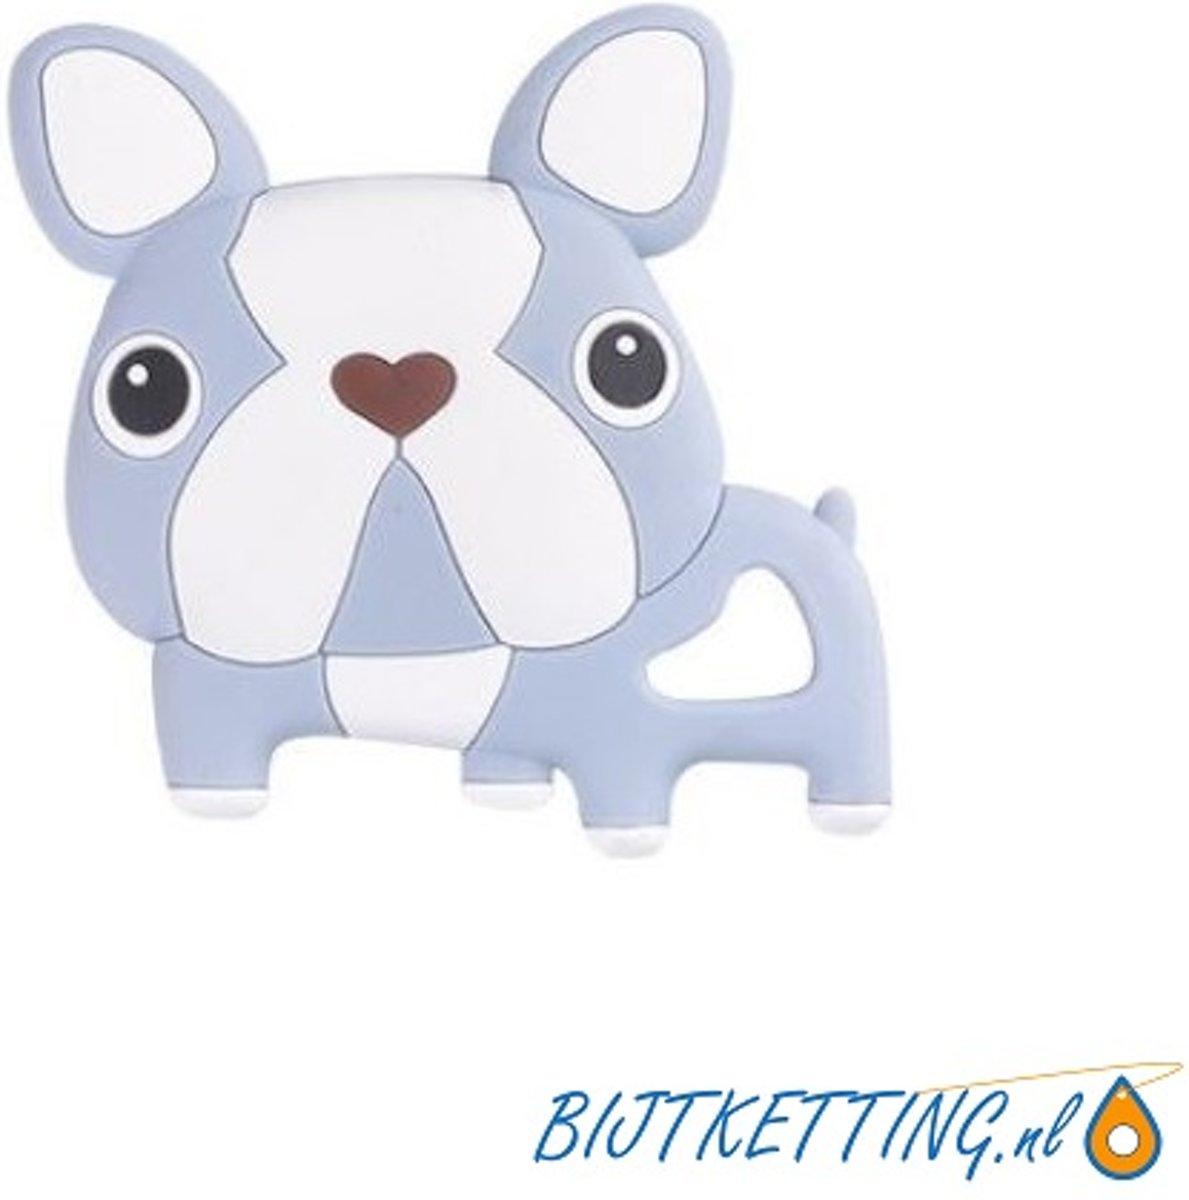 Bijtketting hond | Cartoon Bulldog | Blauw & Wit kopen